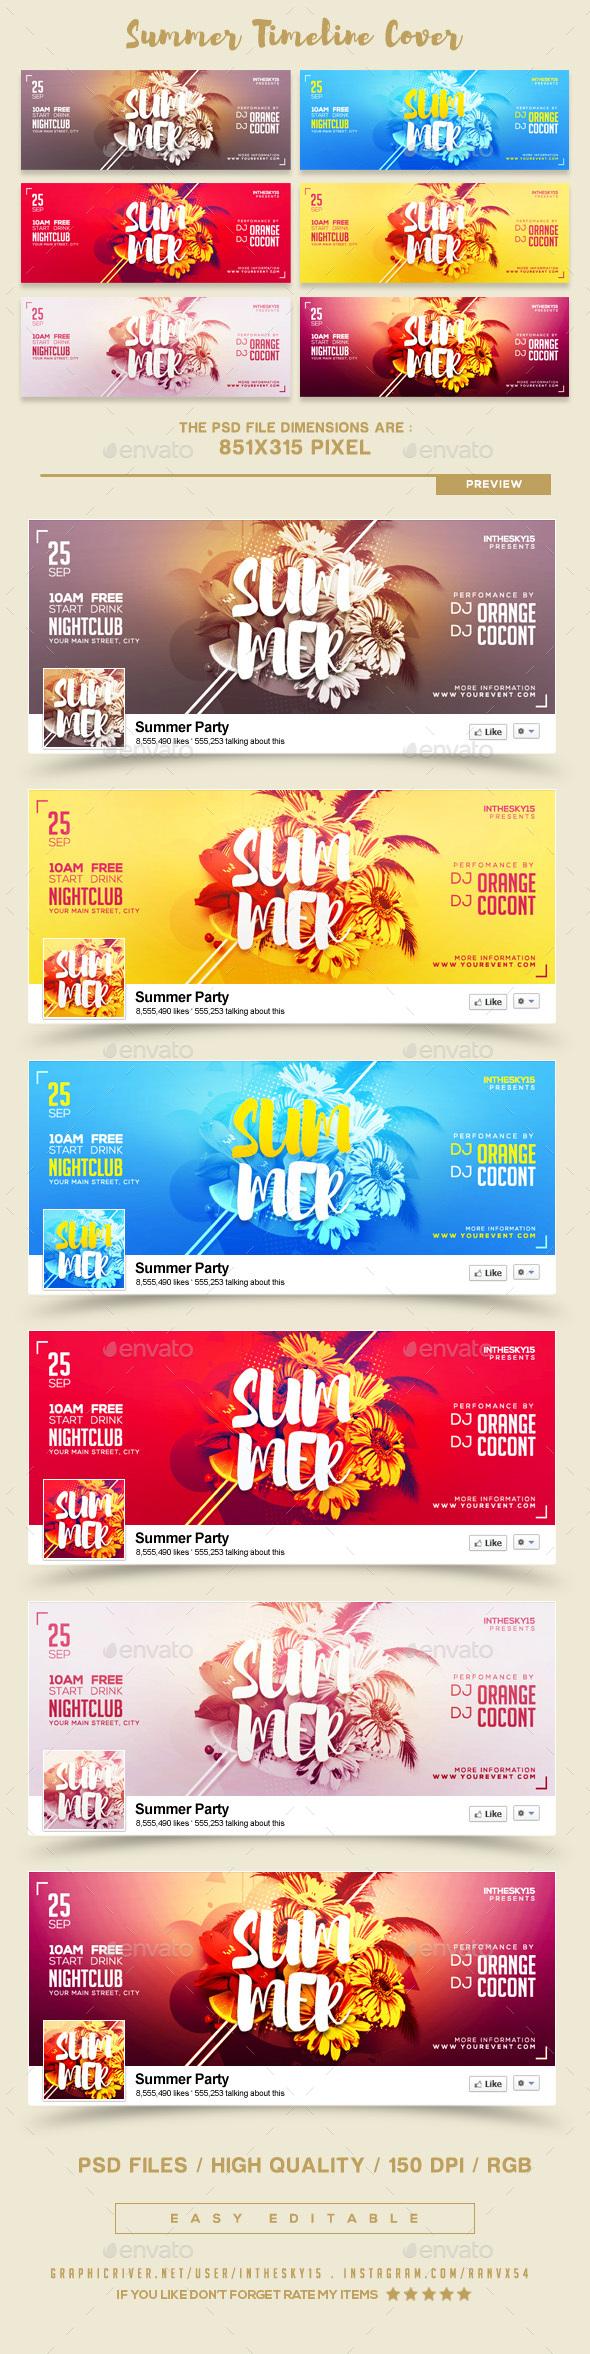 Summer FB Timeline Covers - Facebook Timeline Covers Social Media